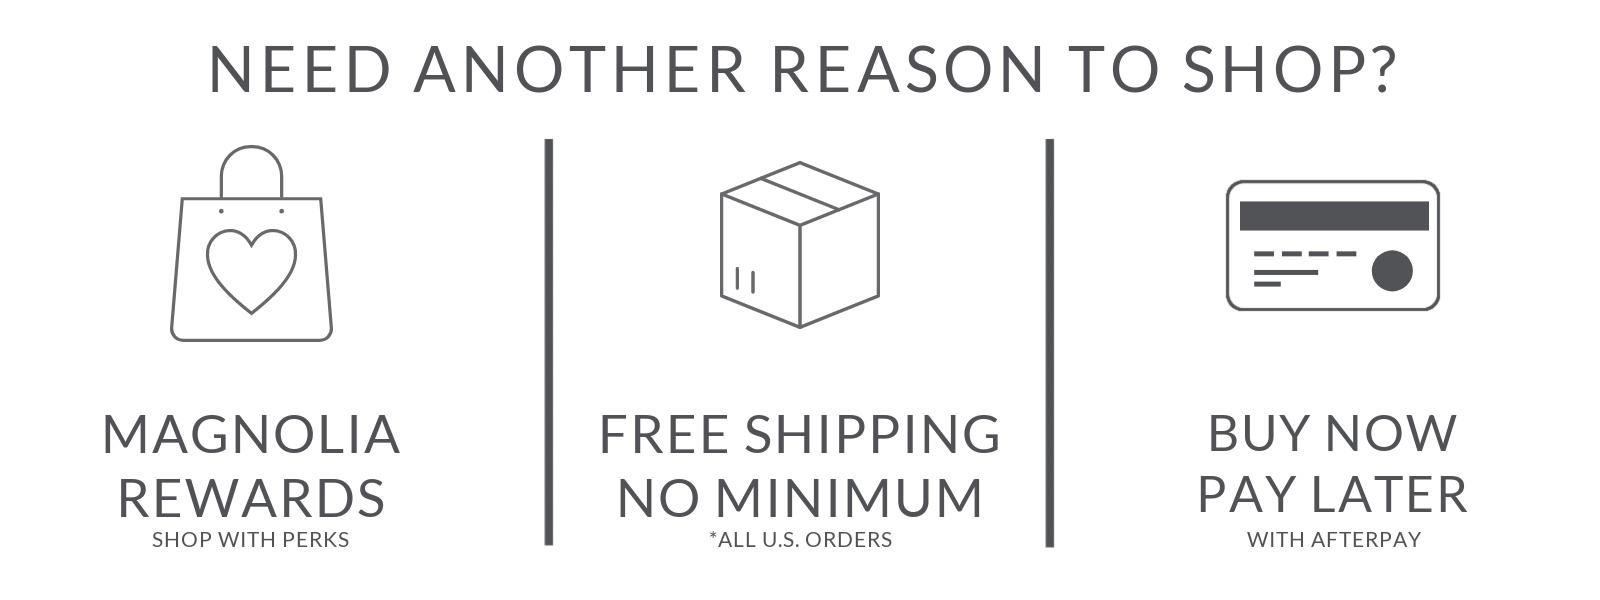 magnolia-rewards-free-shipping-afterpay.jpg